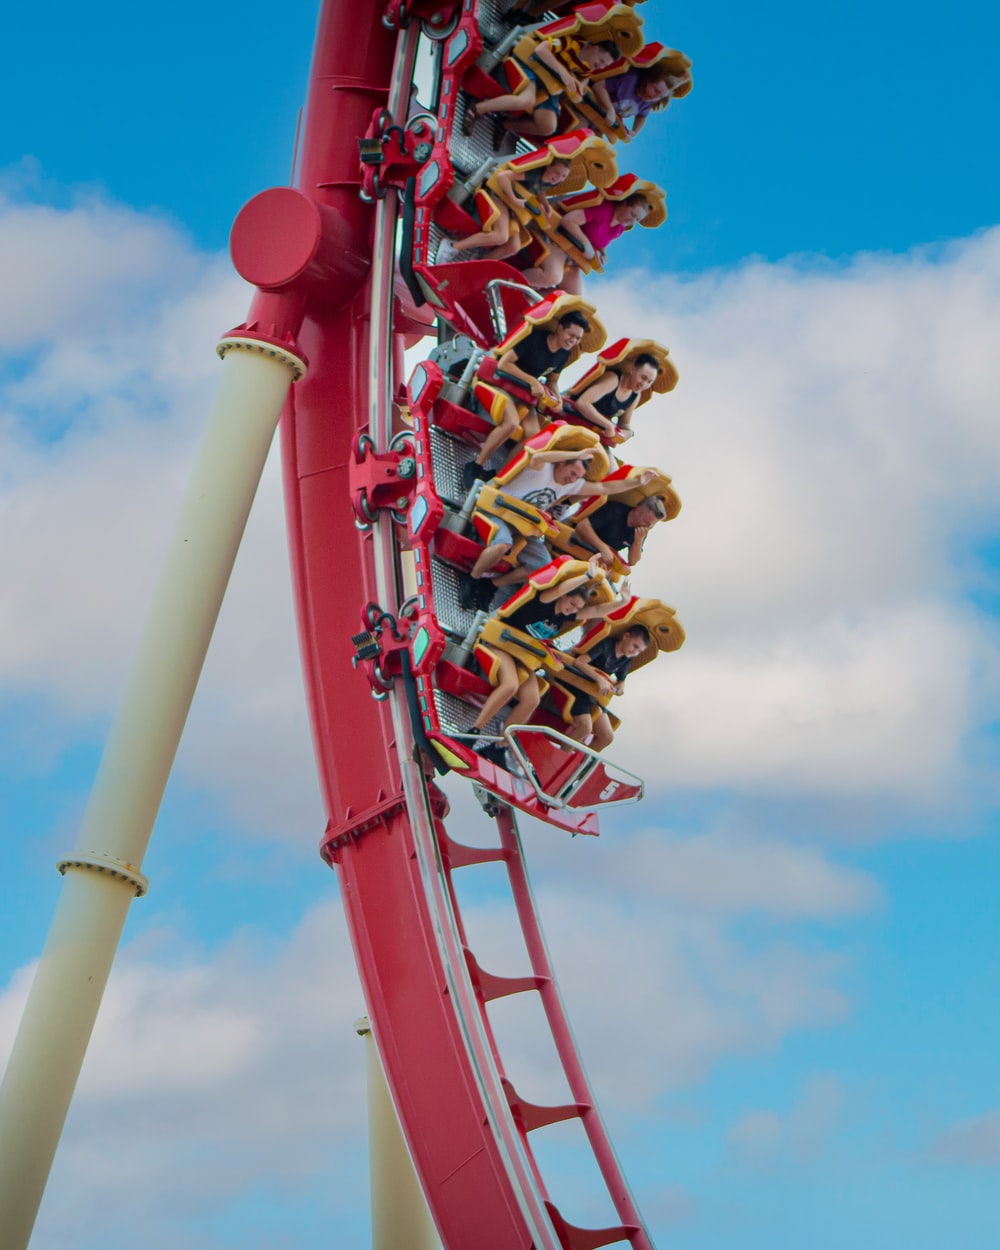 people riding roller coaster during daytime